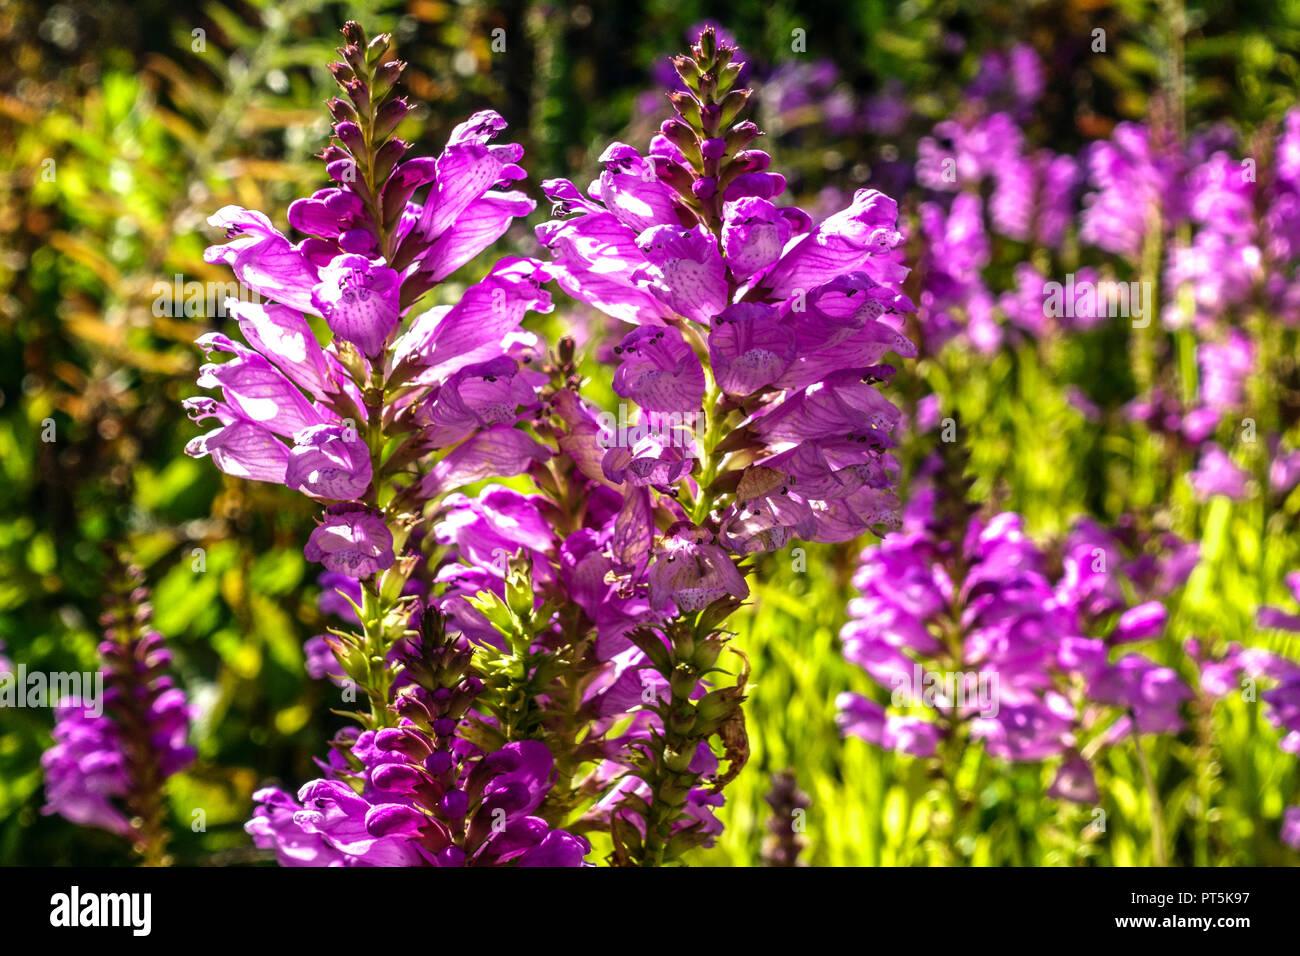 Obedient Plant, Physostegia virginiana 'Bouquet Rose' - Stock Image